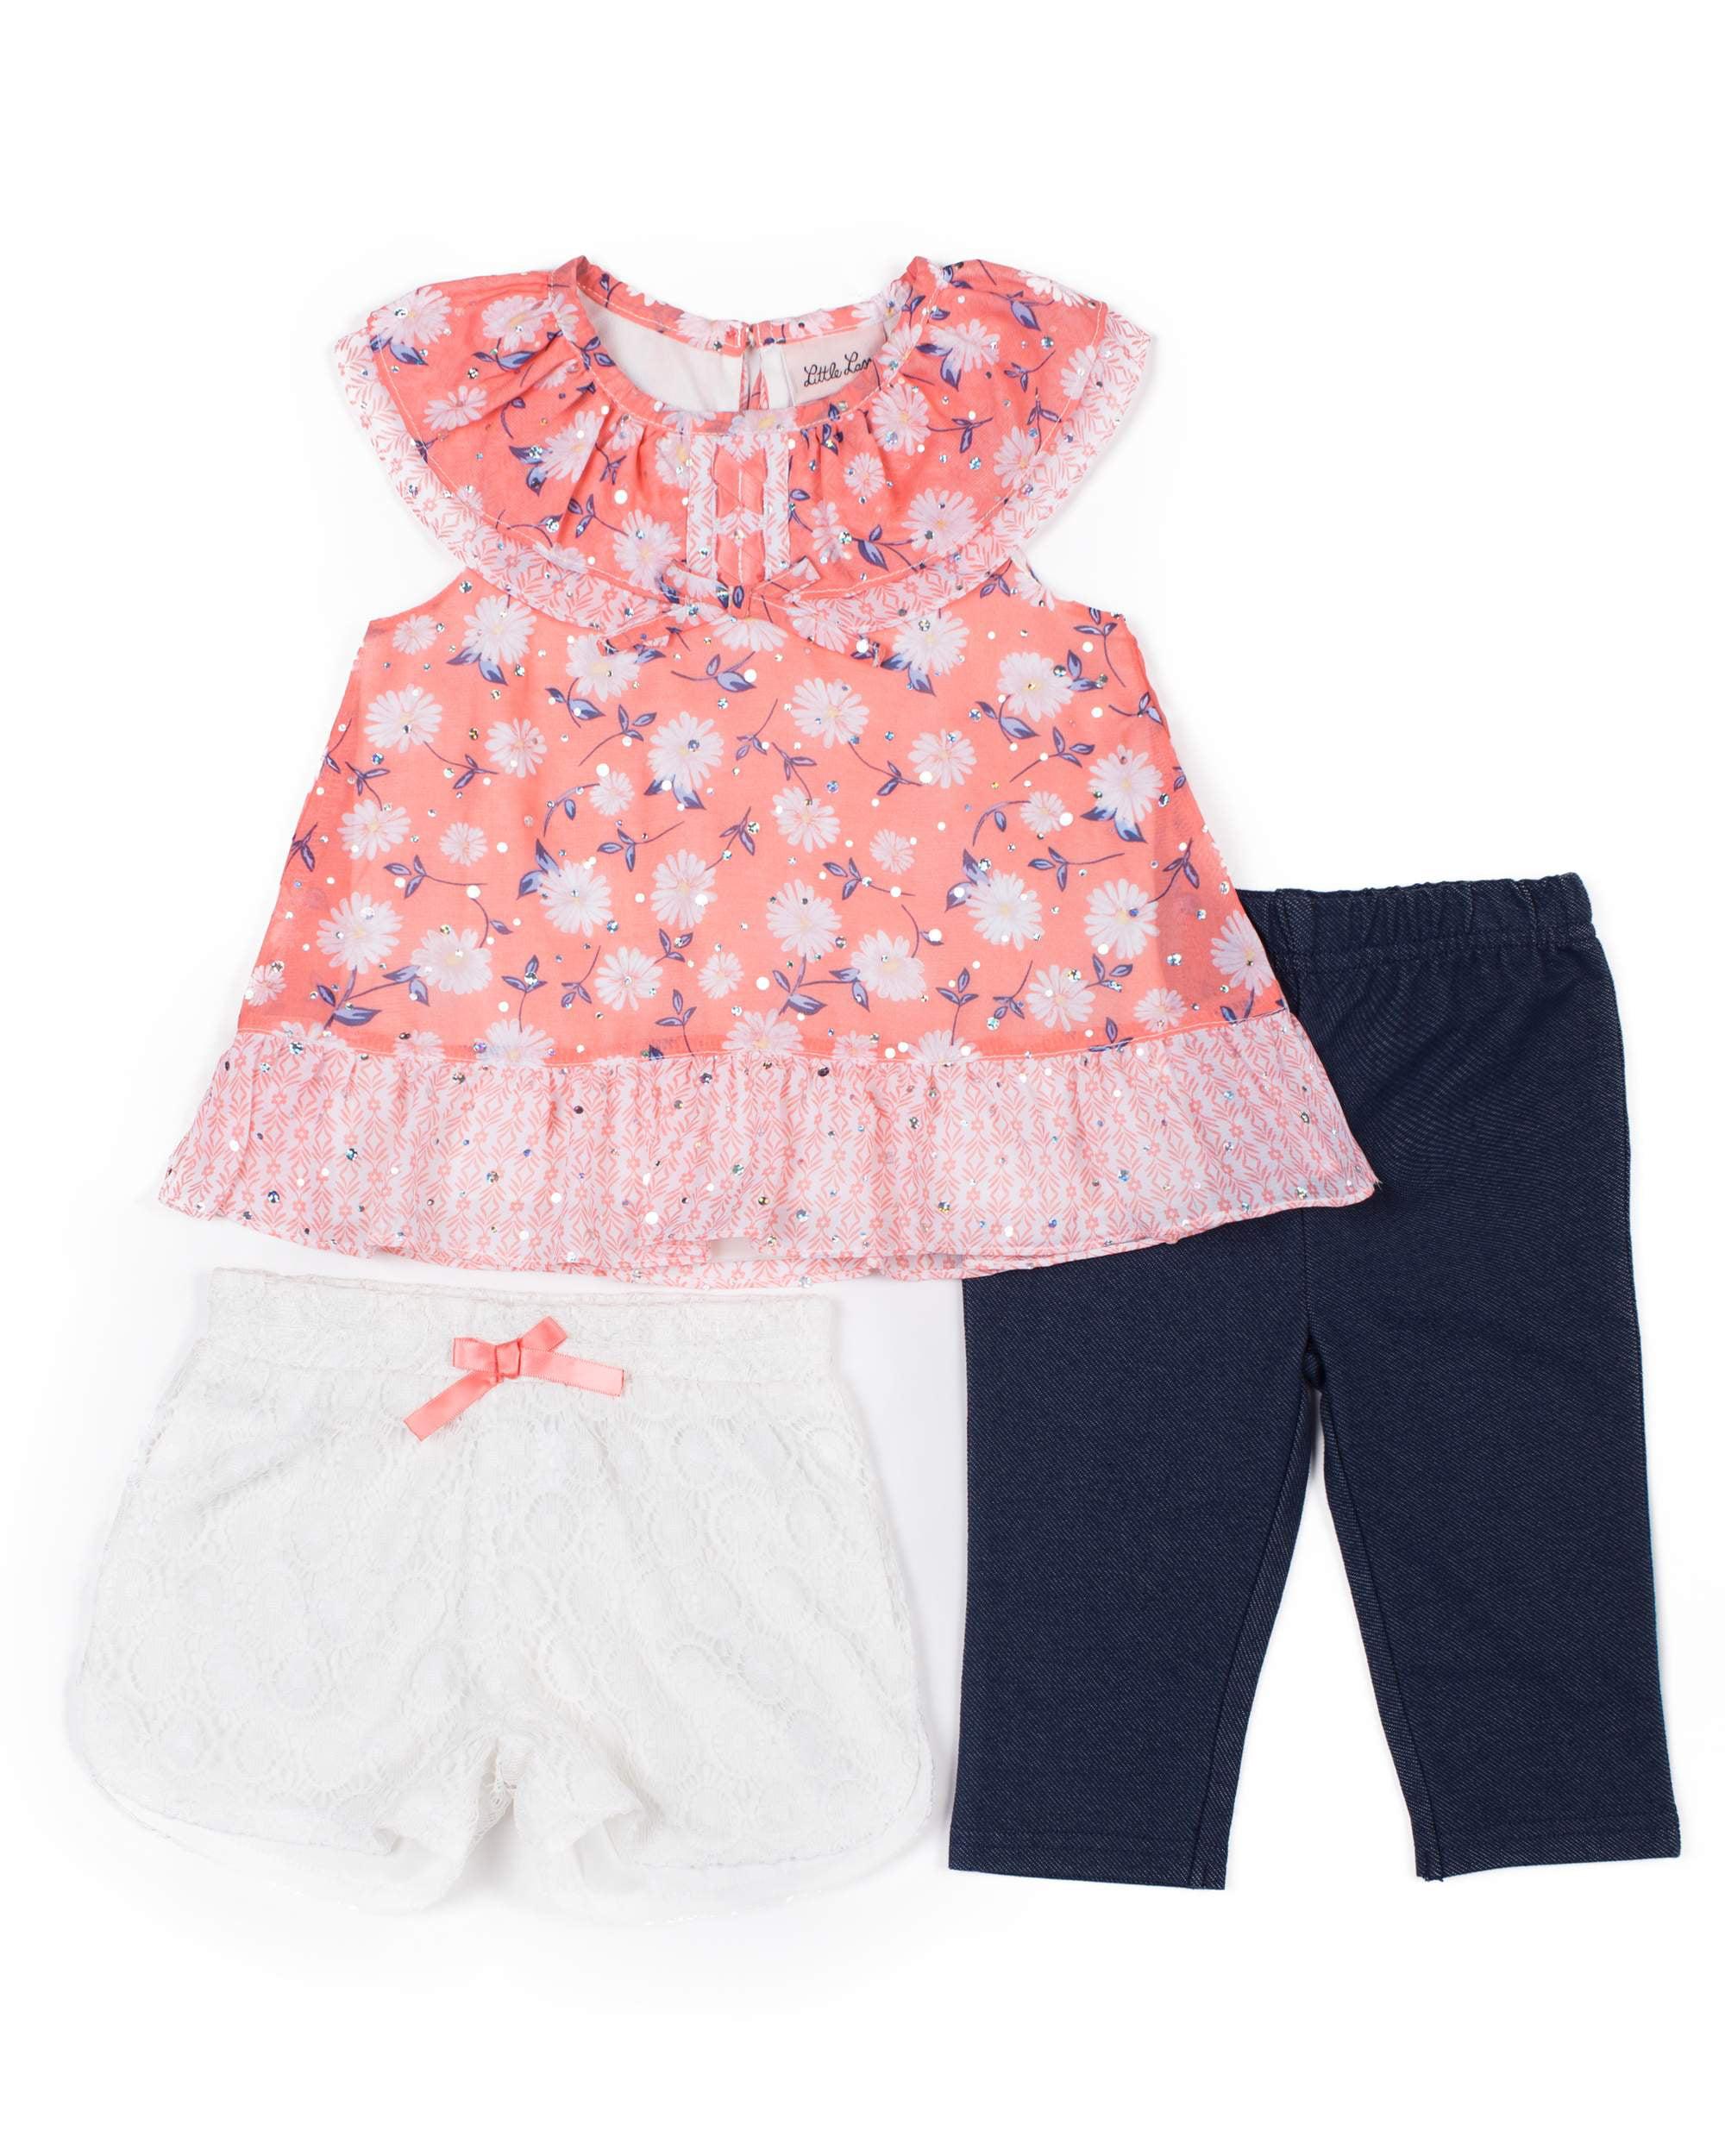 Chiffon Top, Capri Legging, and Lace Short, 3-Piece Mix and Match Set (Little Girls)